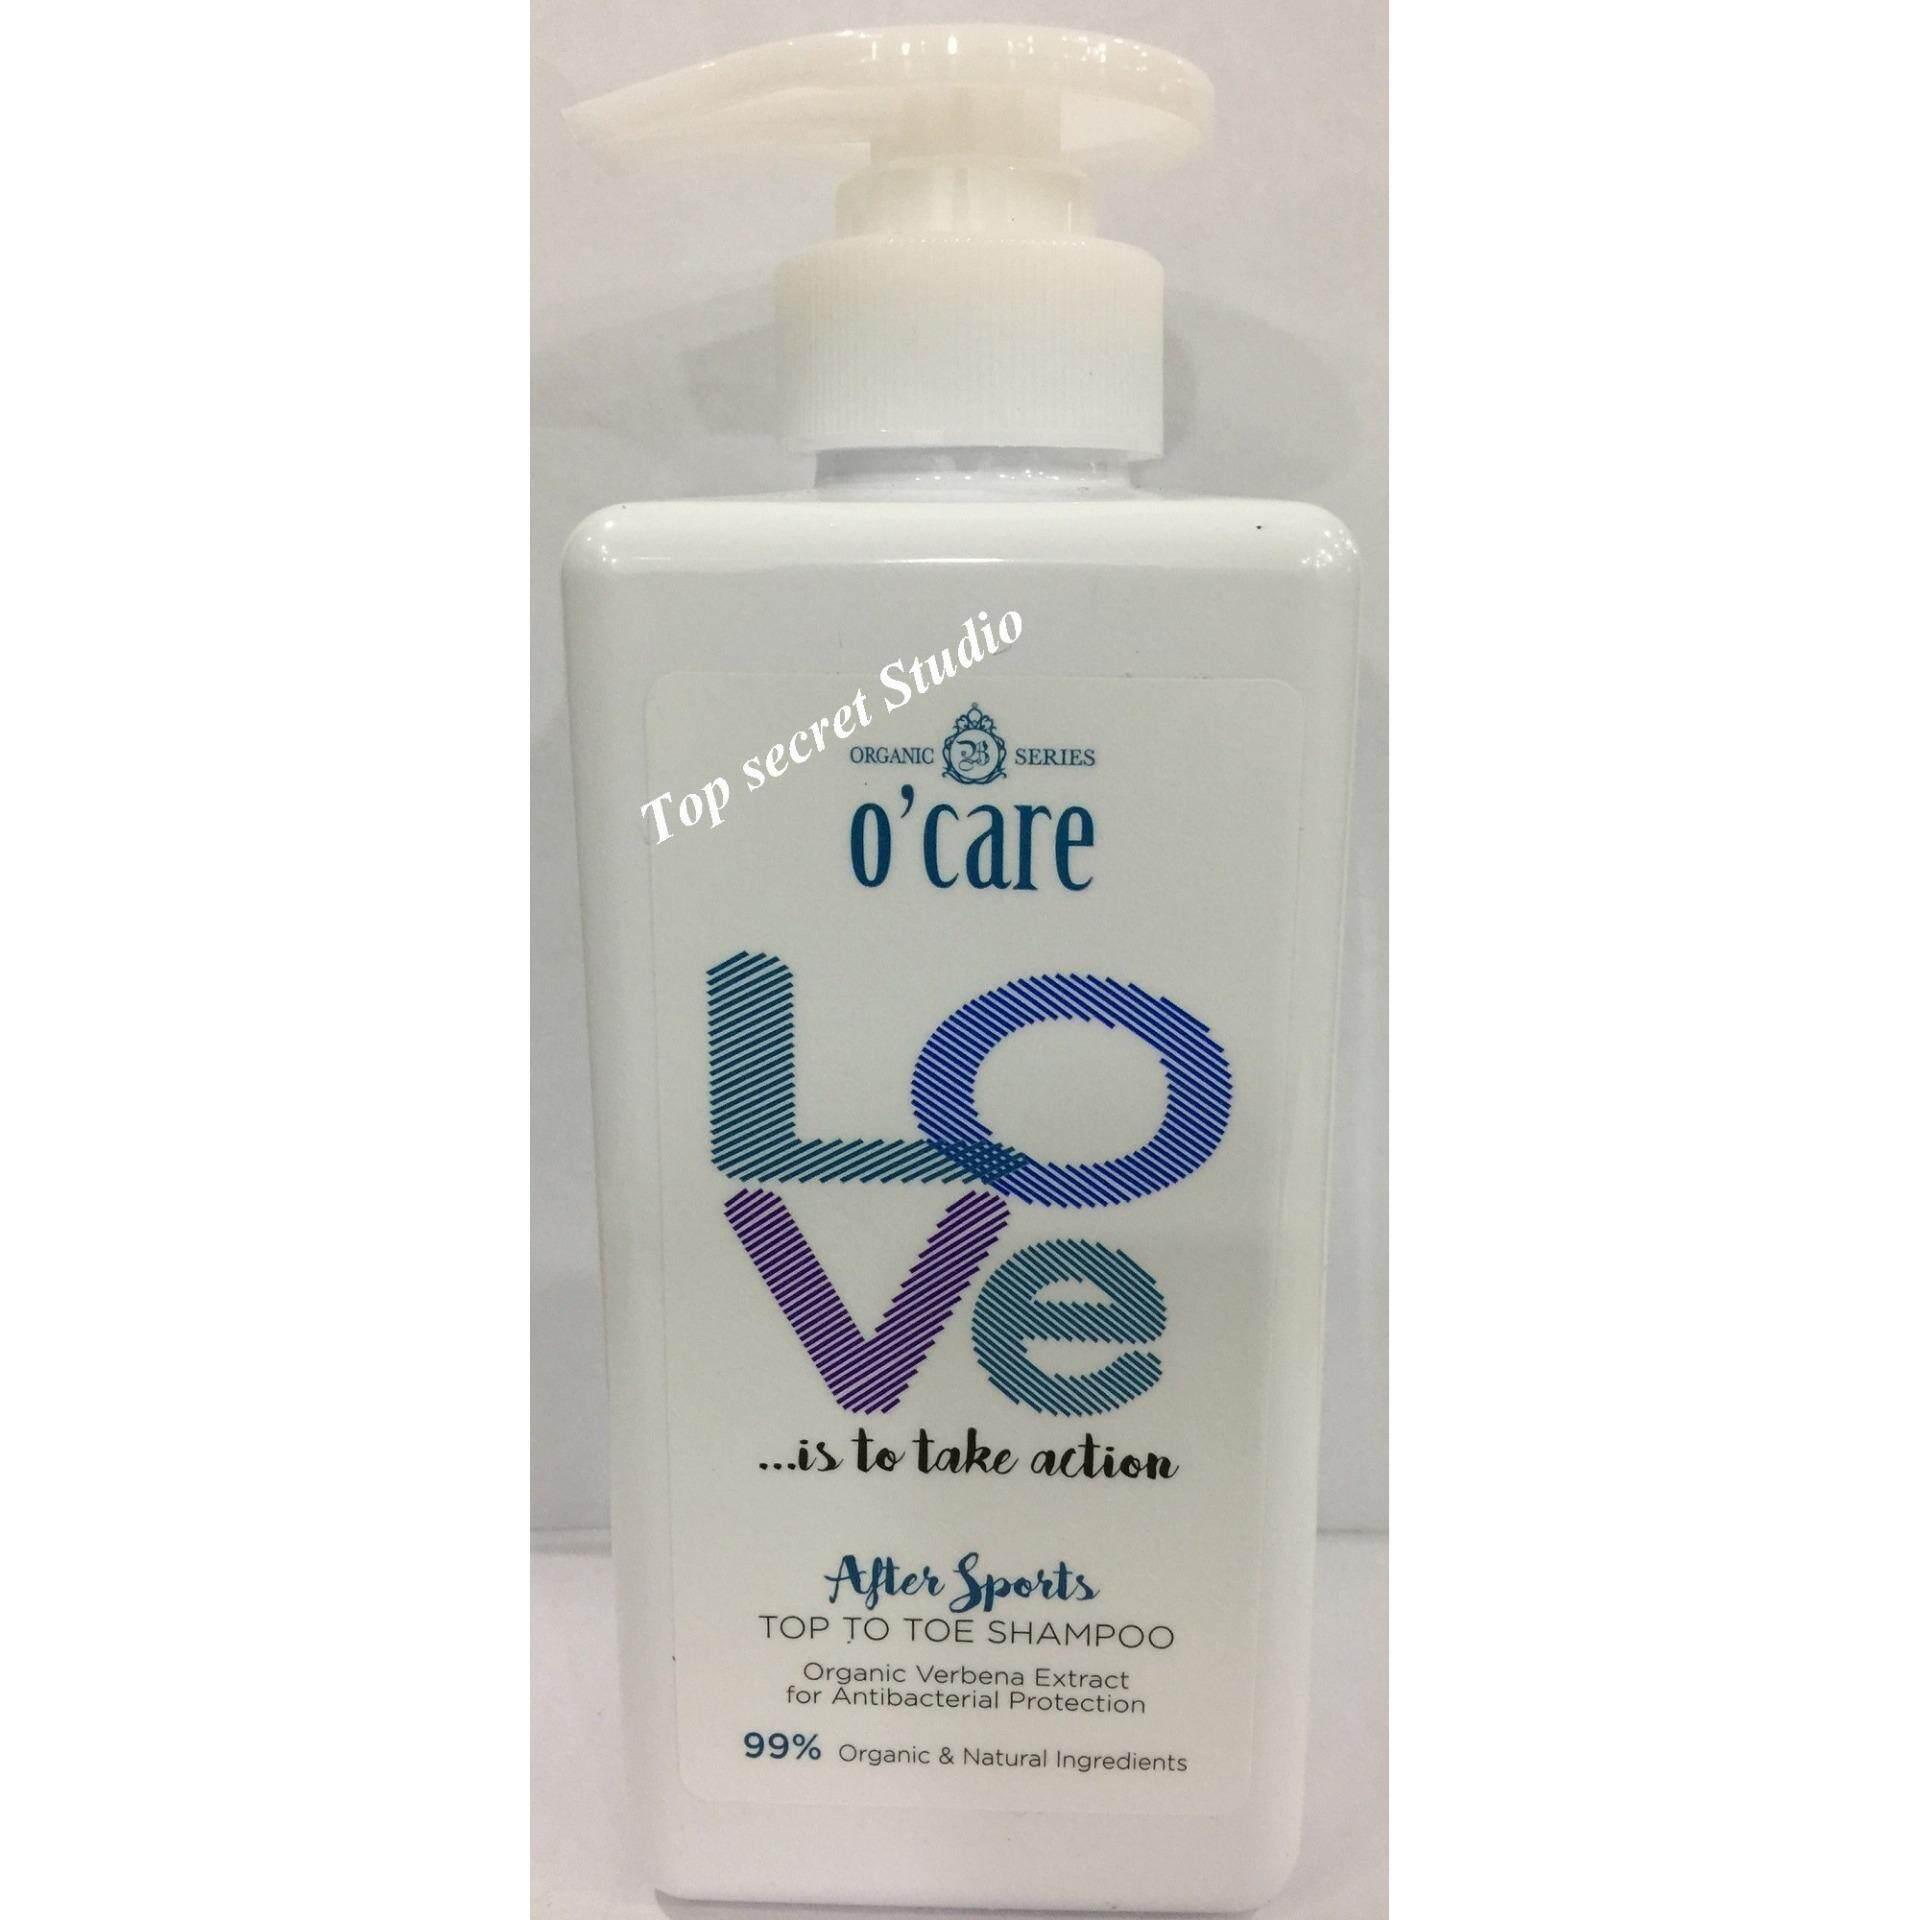 O'Care Love After Sports Top To Toe Shampoo - 500ml